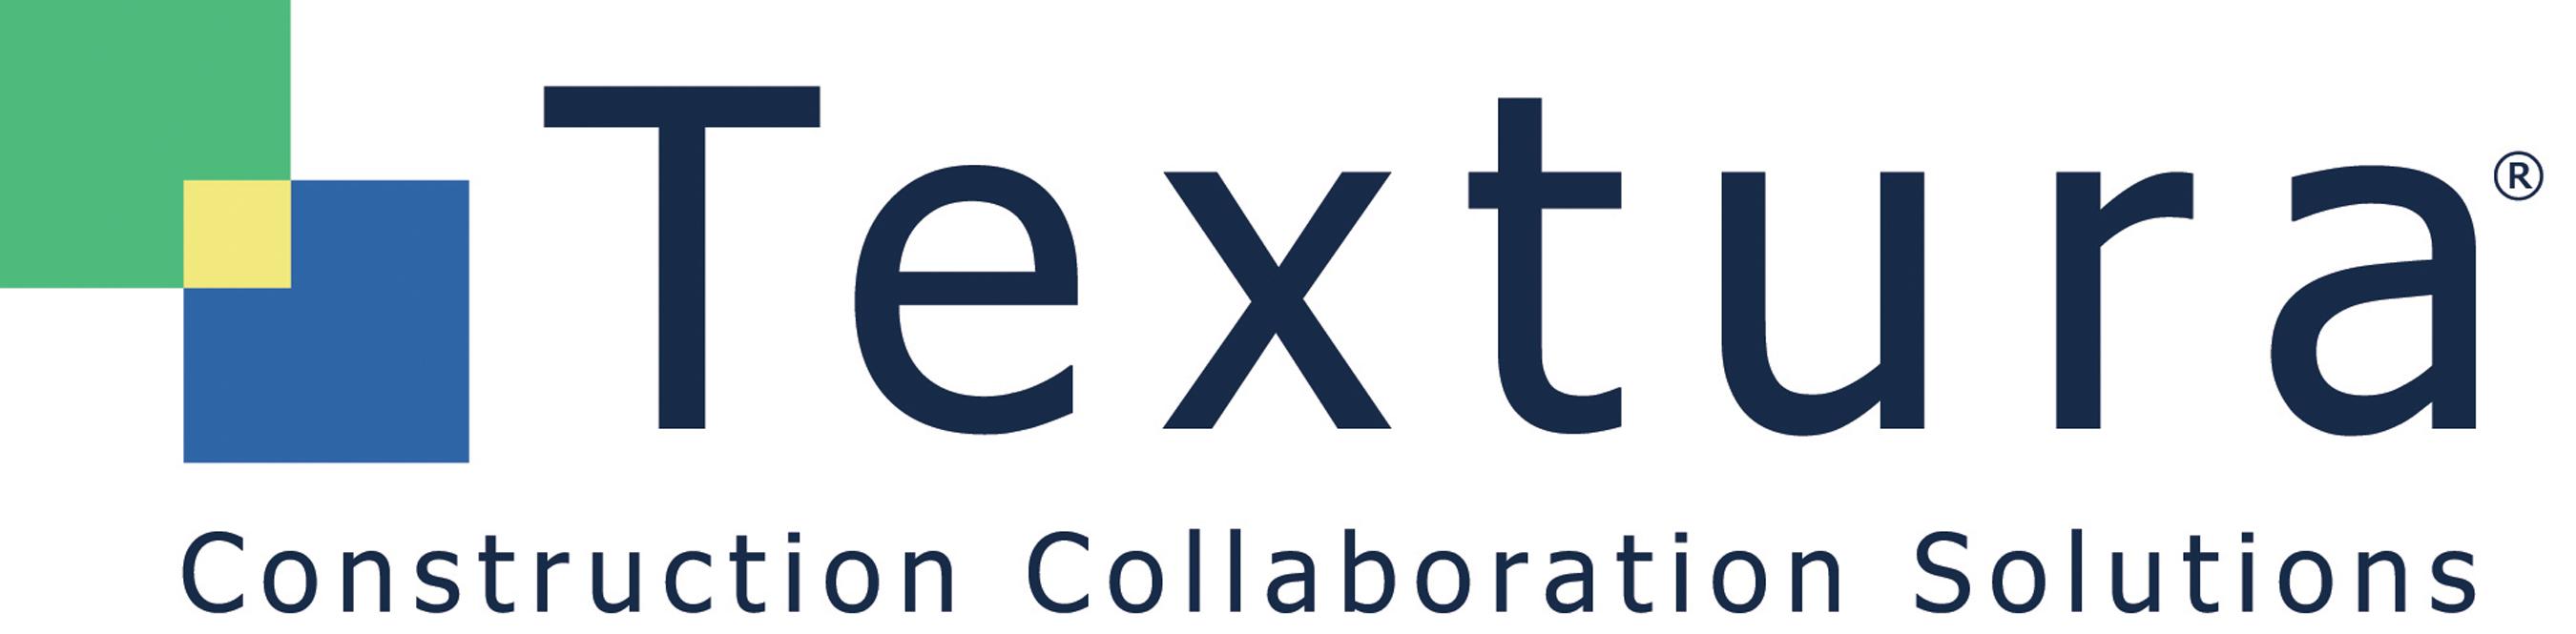 Textura Corporation logo.